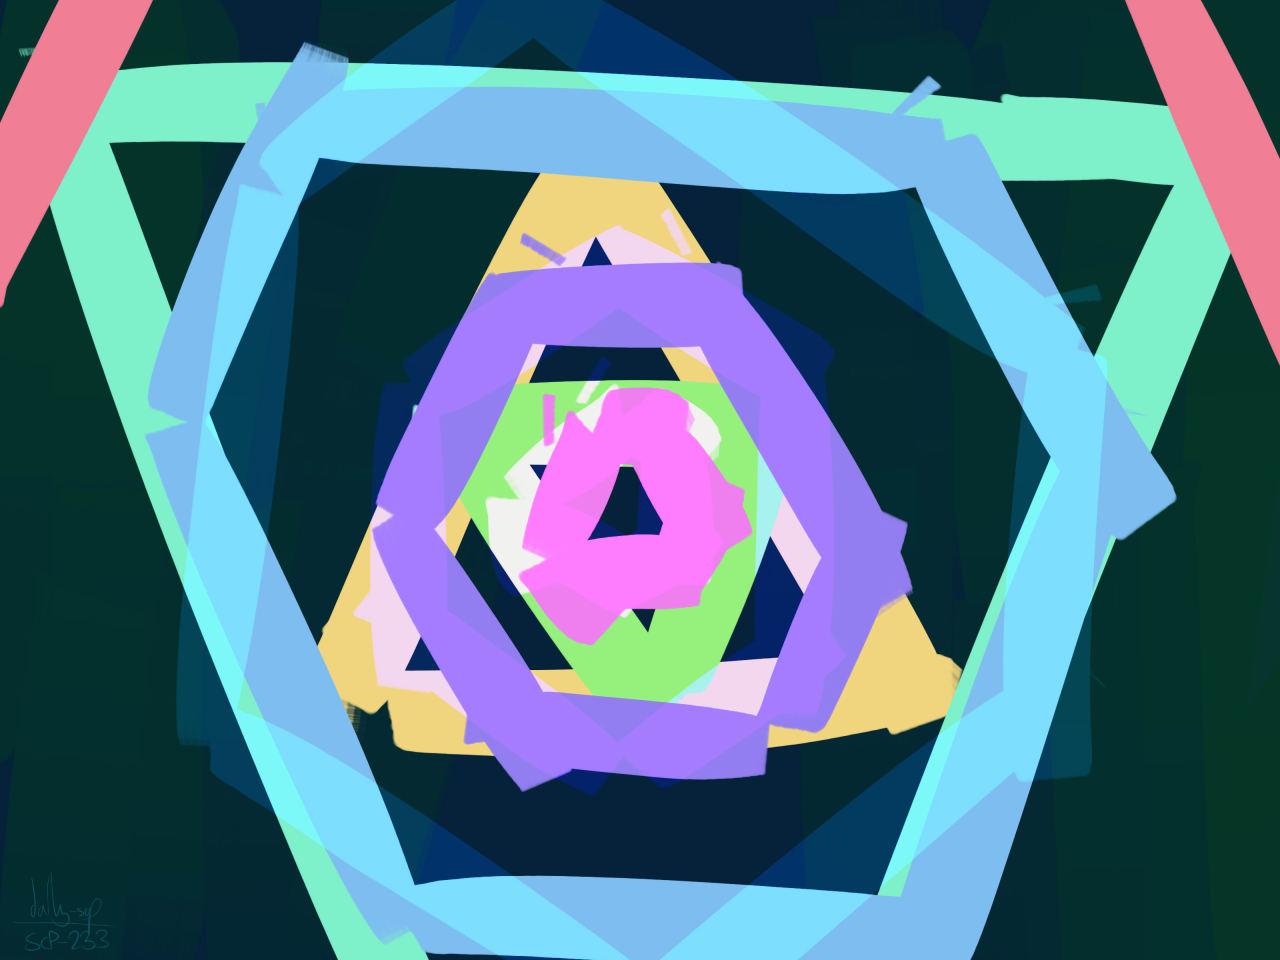 SCP-233 - 23-Sided Polyhedron (Khối đa diện 23 mặt)